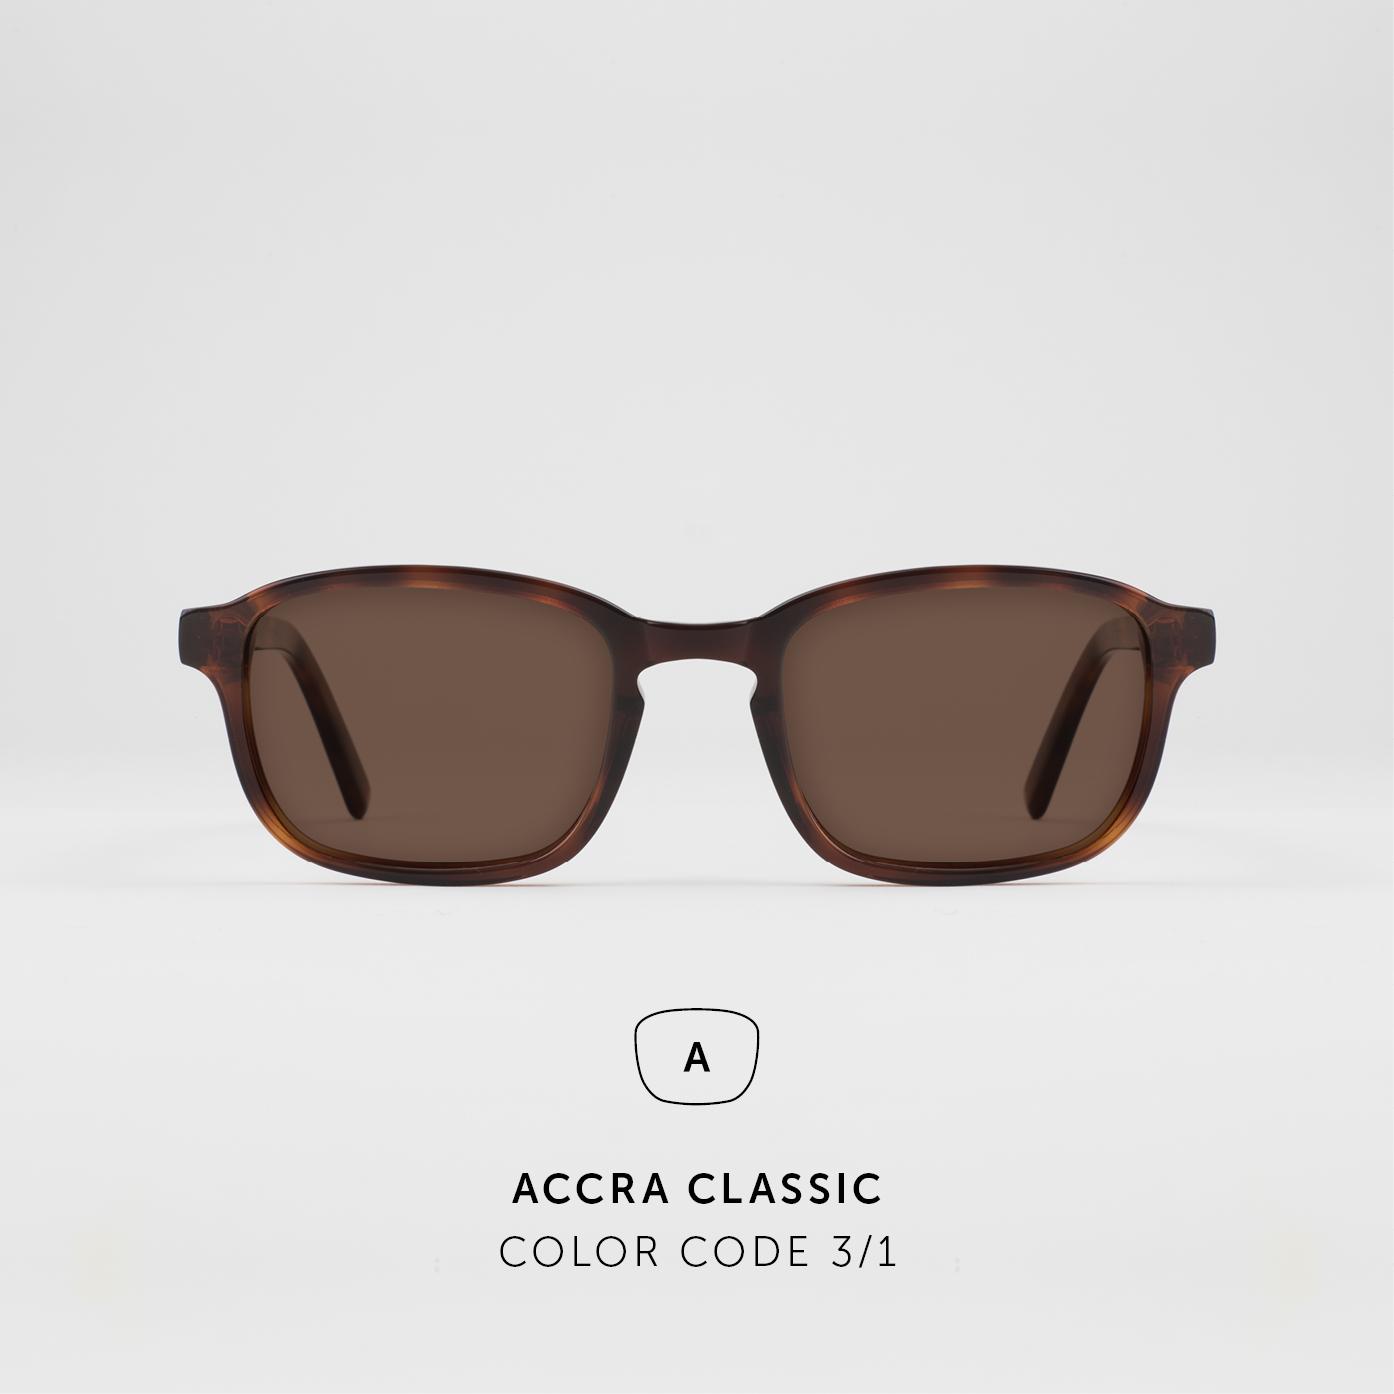 AccraClassic22.jpg